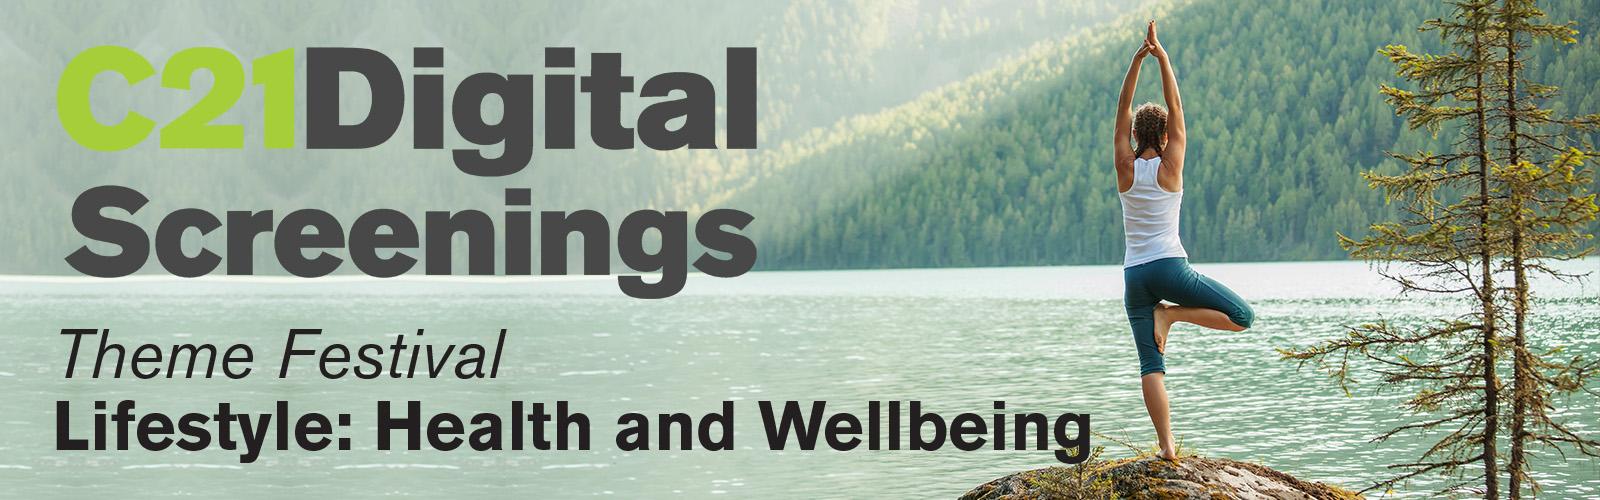 Theme Festival - Lifestyle: Health & Wellbeing